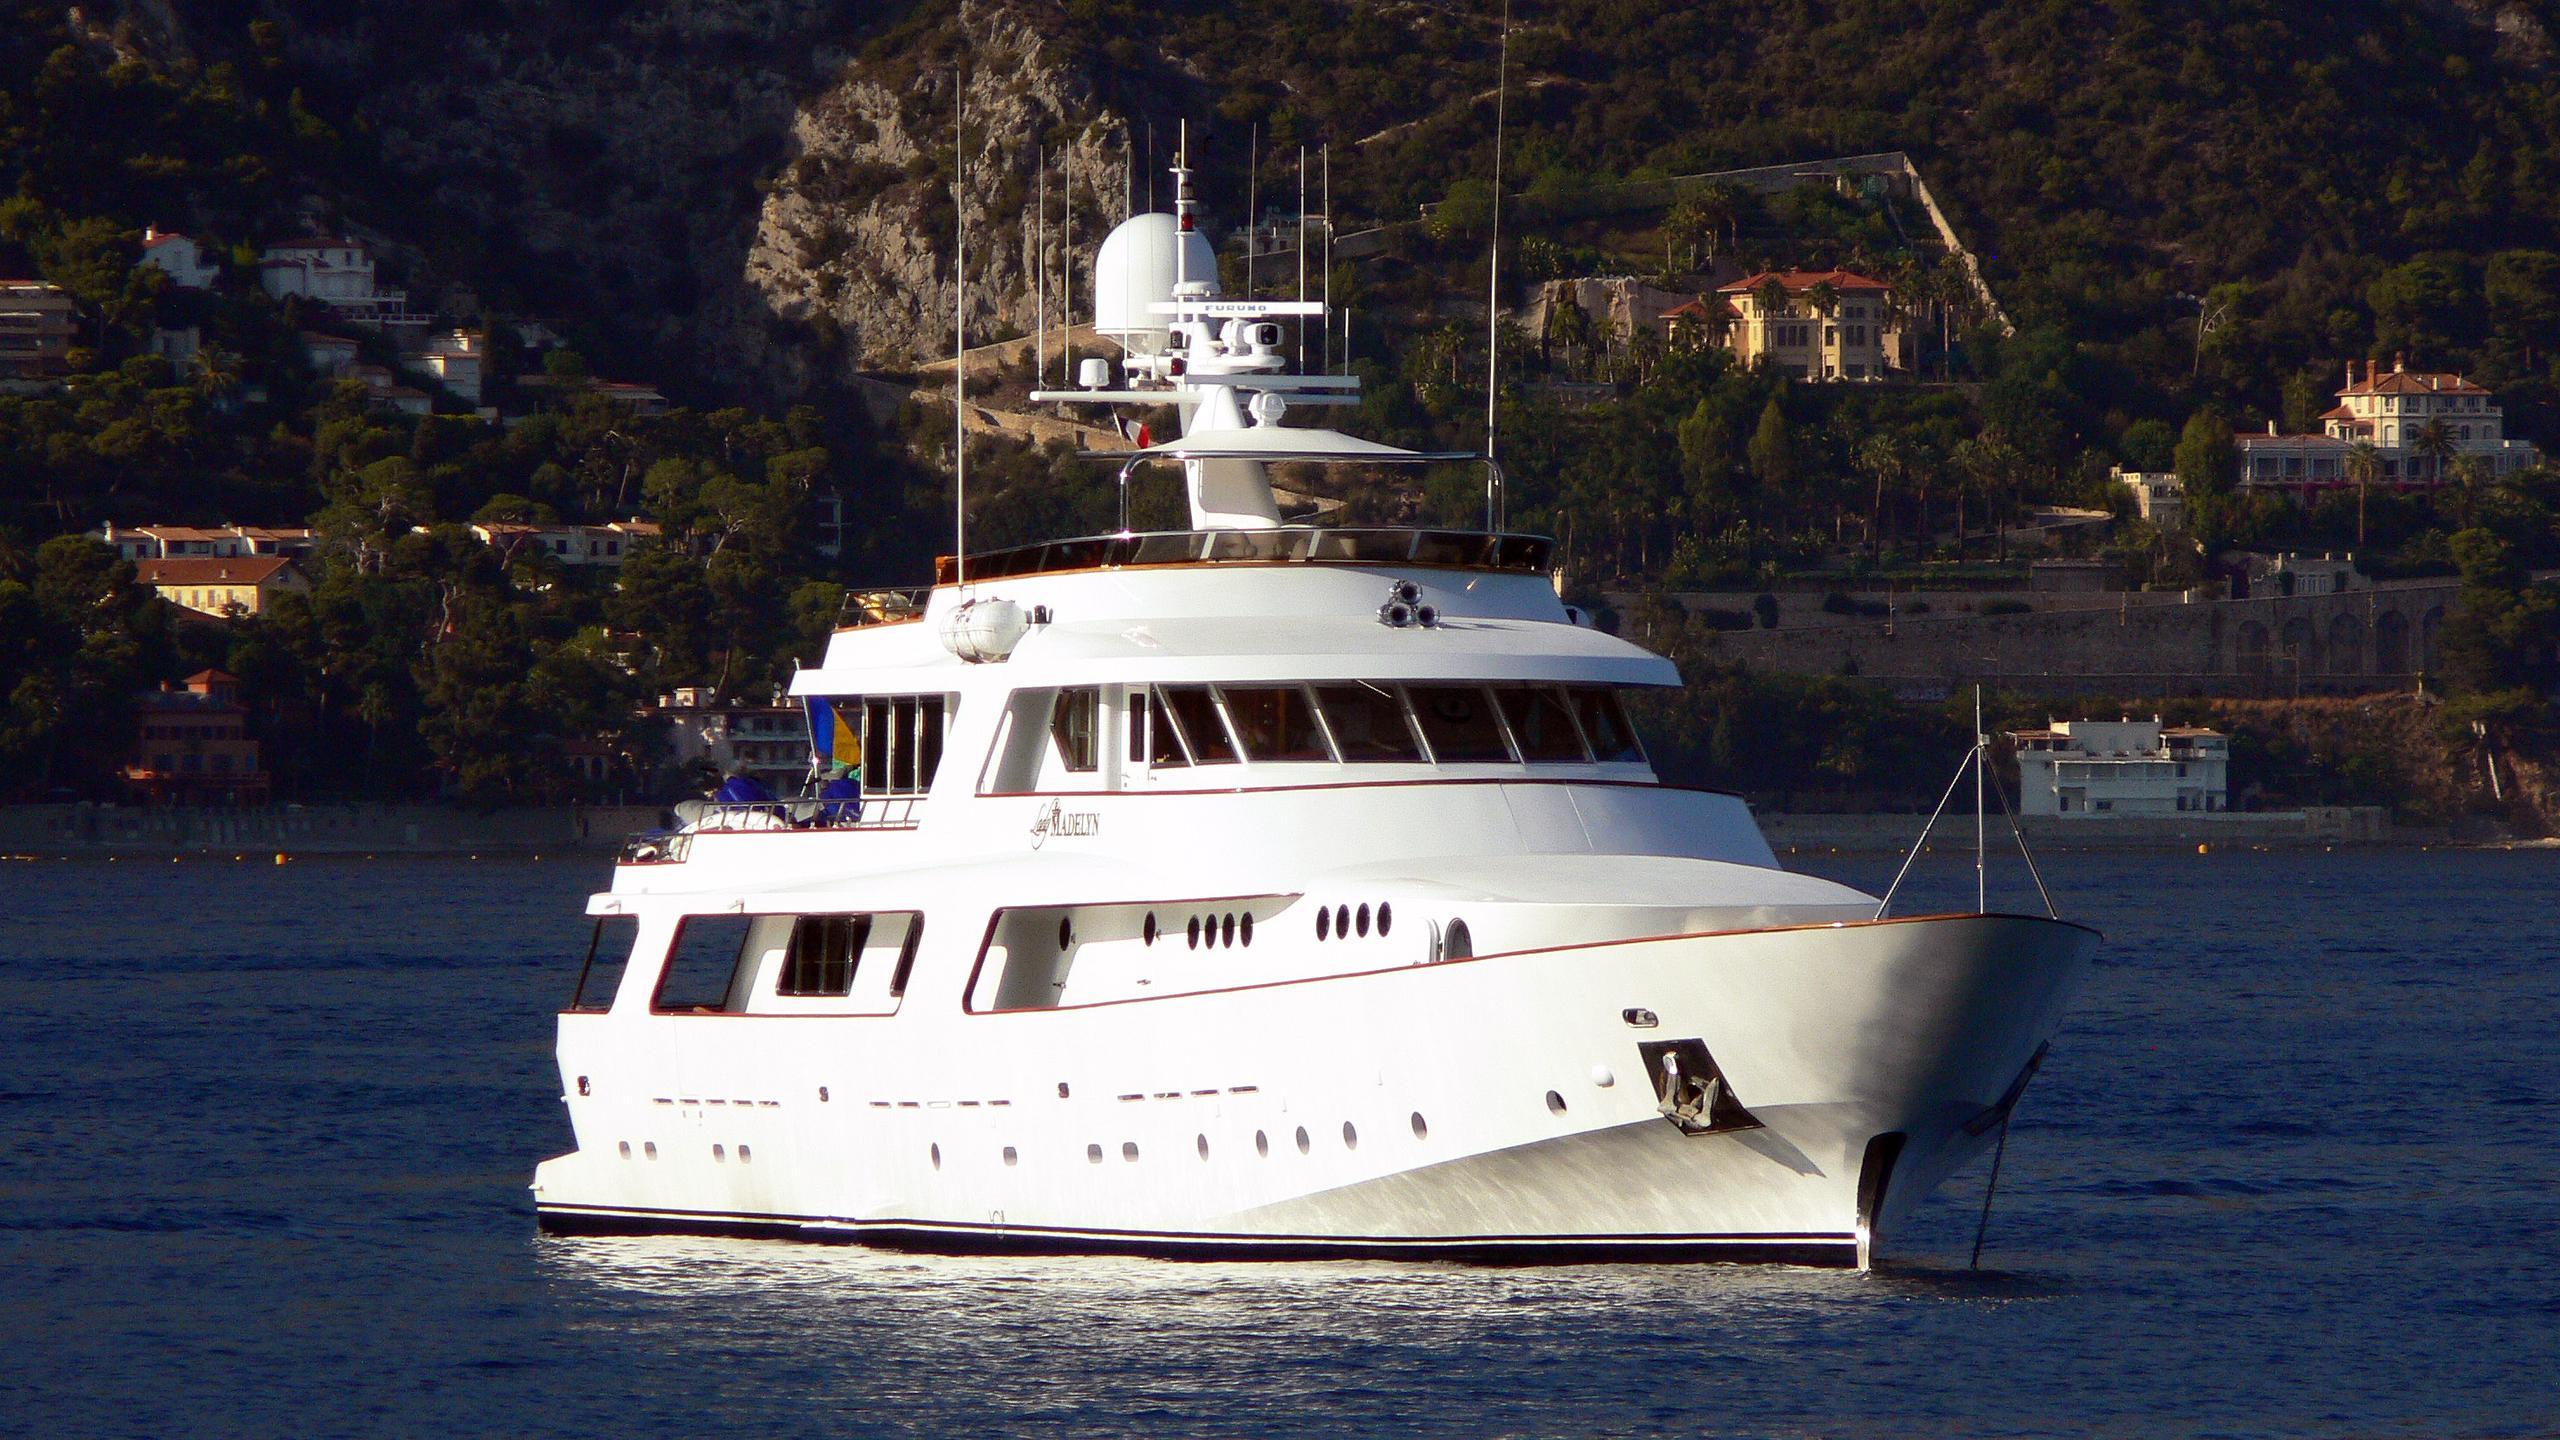 nordic-star-motor-yacht-crn-1978-37m-bow